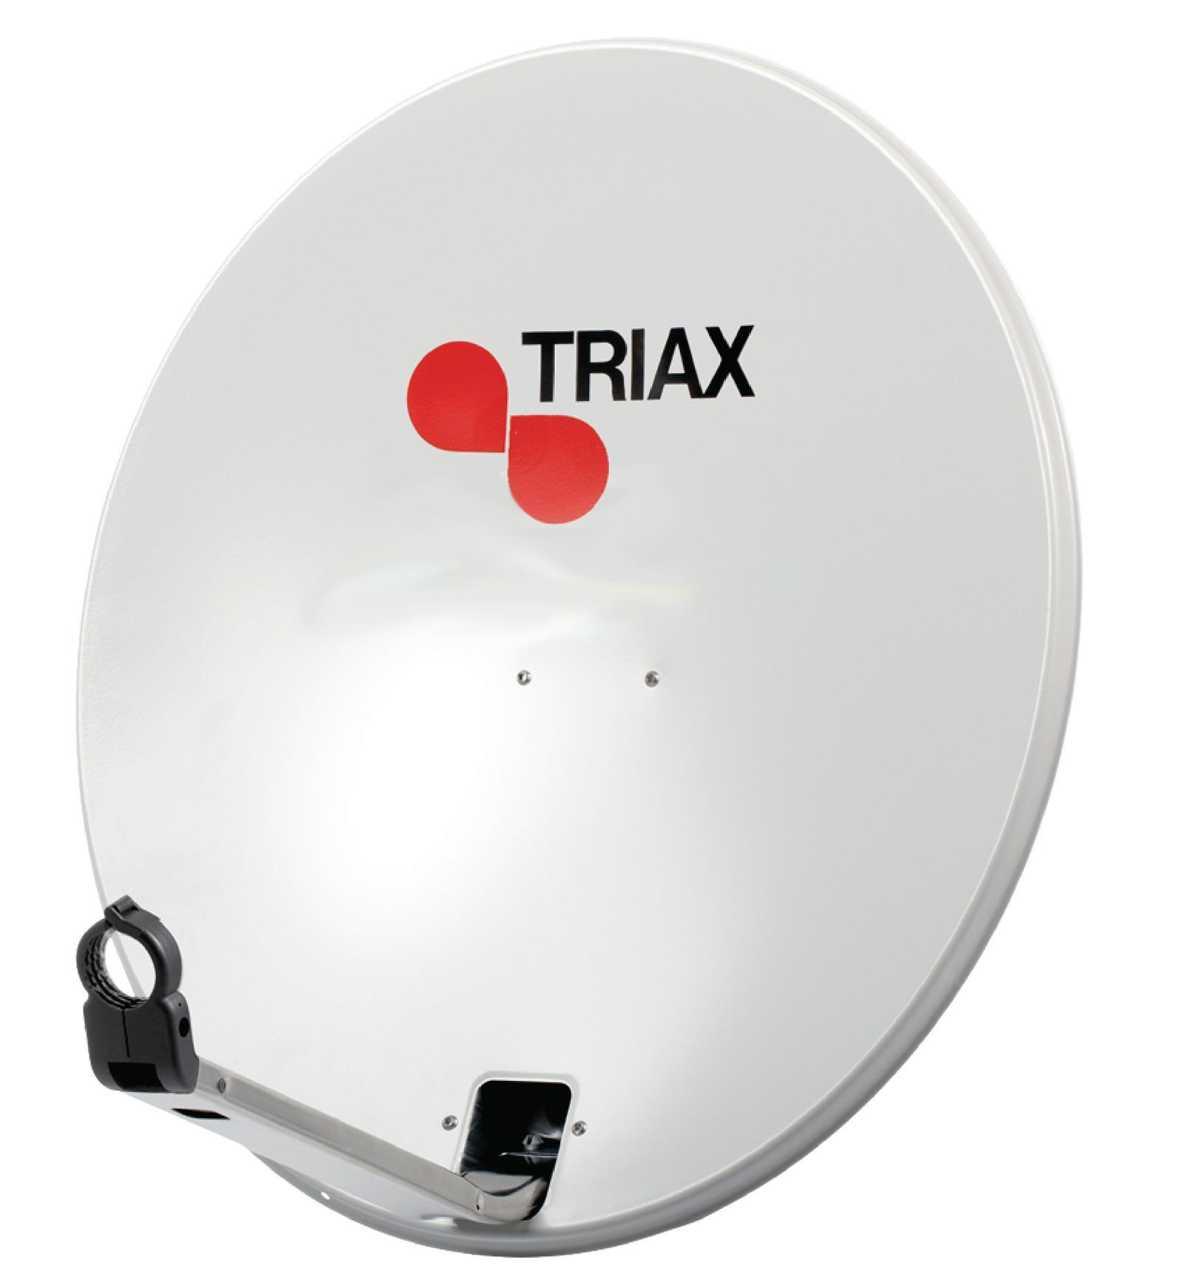 TRIAX TDS 110 Antenne Stahl 110cm Hellgrau MONANT-083